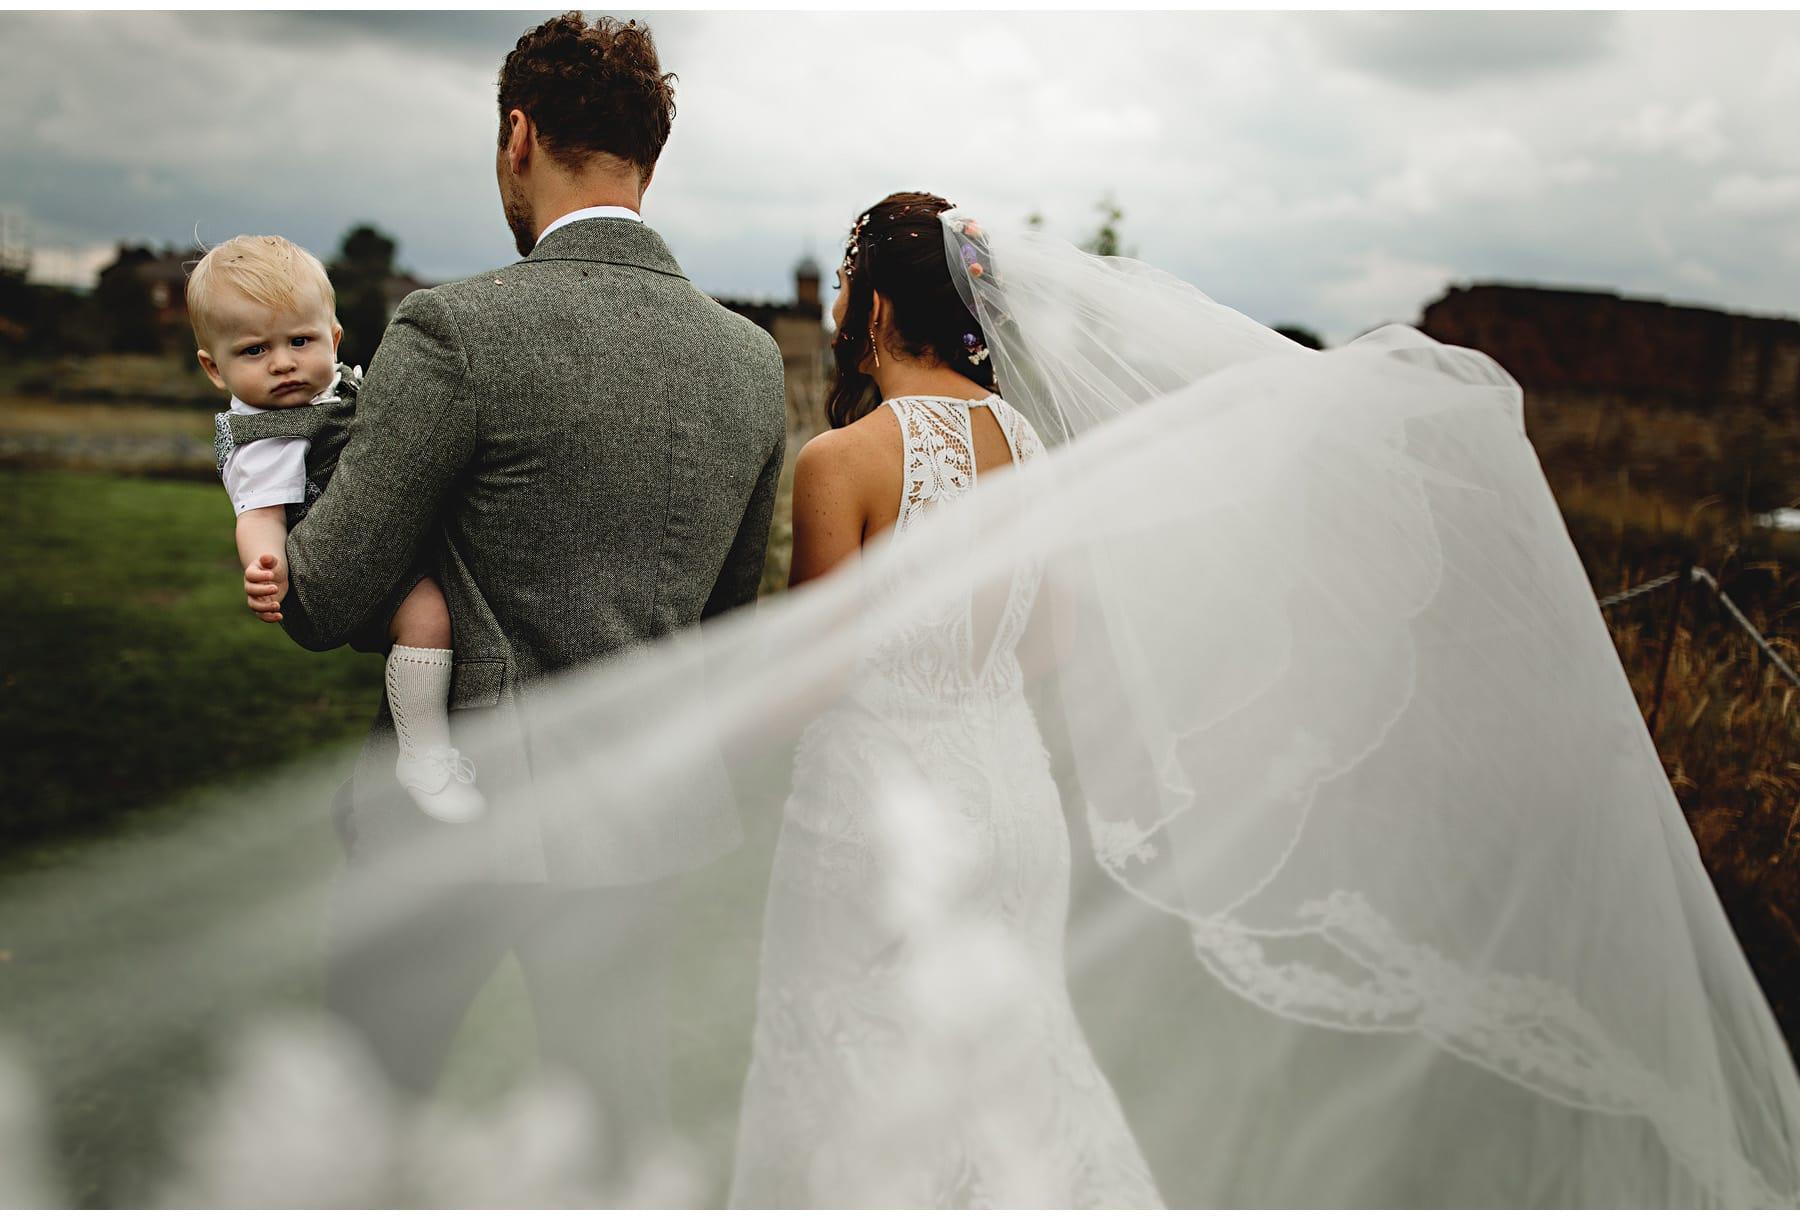 the bride & groom walking through the veil